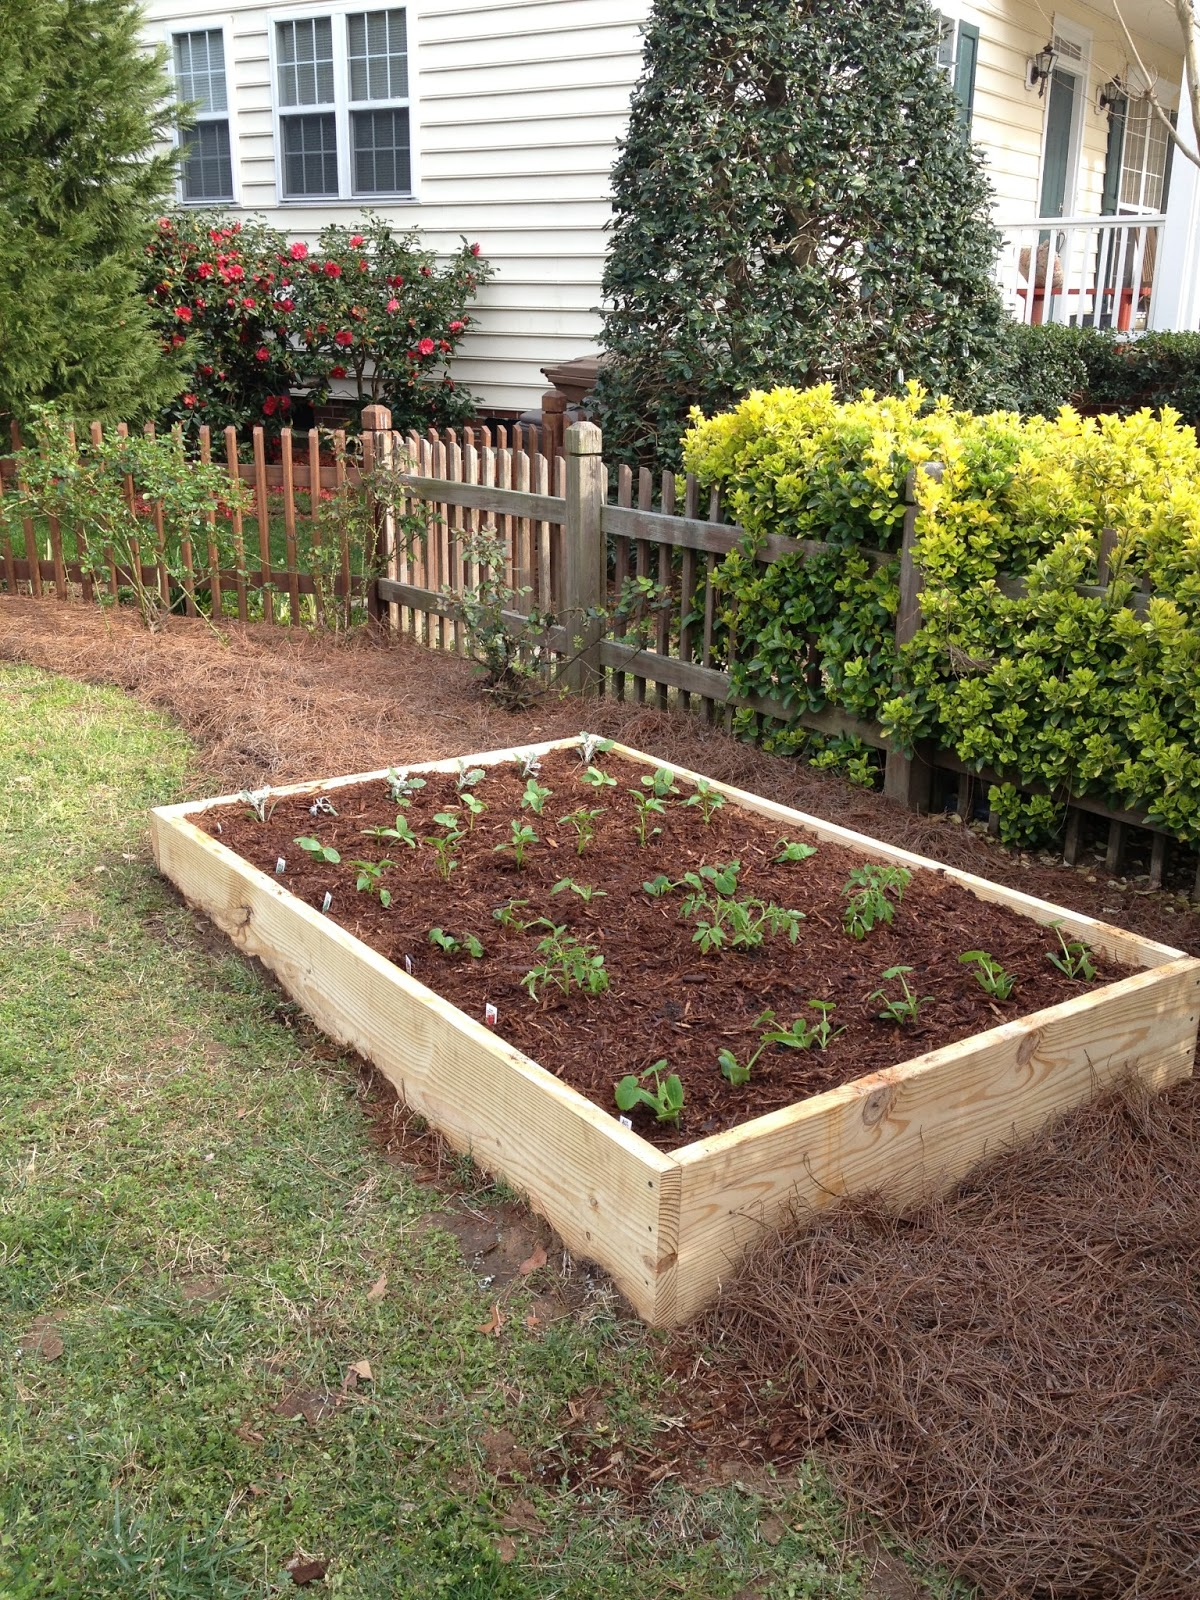 Raised Bed Garden Design: Not So Newlywed McGees: DIY Raised Garden Bed